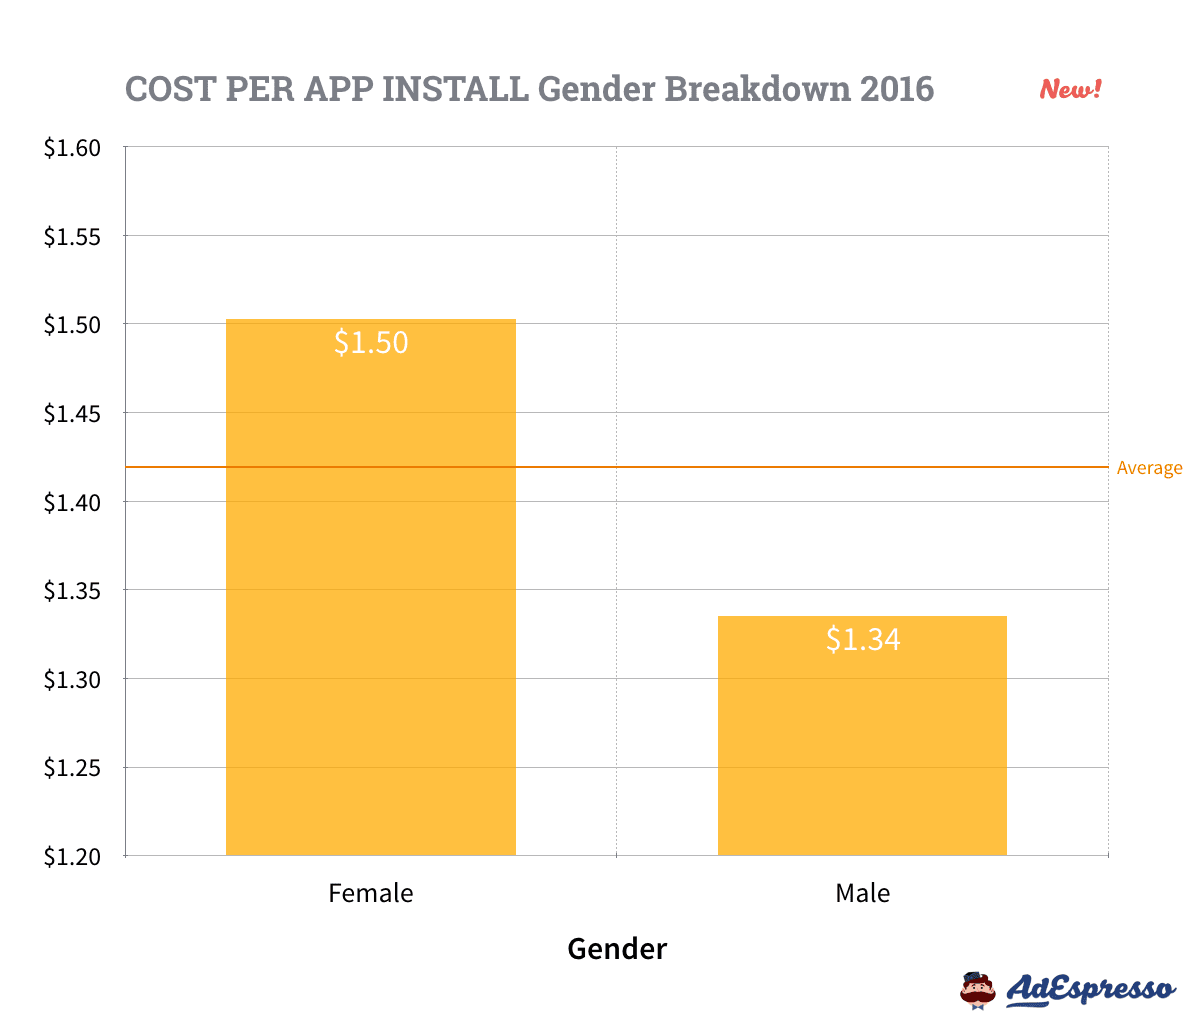 Facebook Ads Cost per App Install - Gender Averages